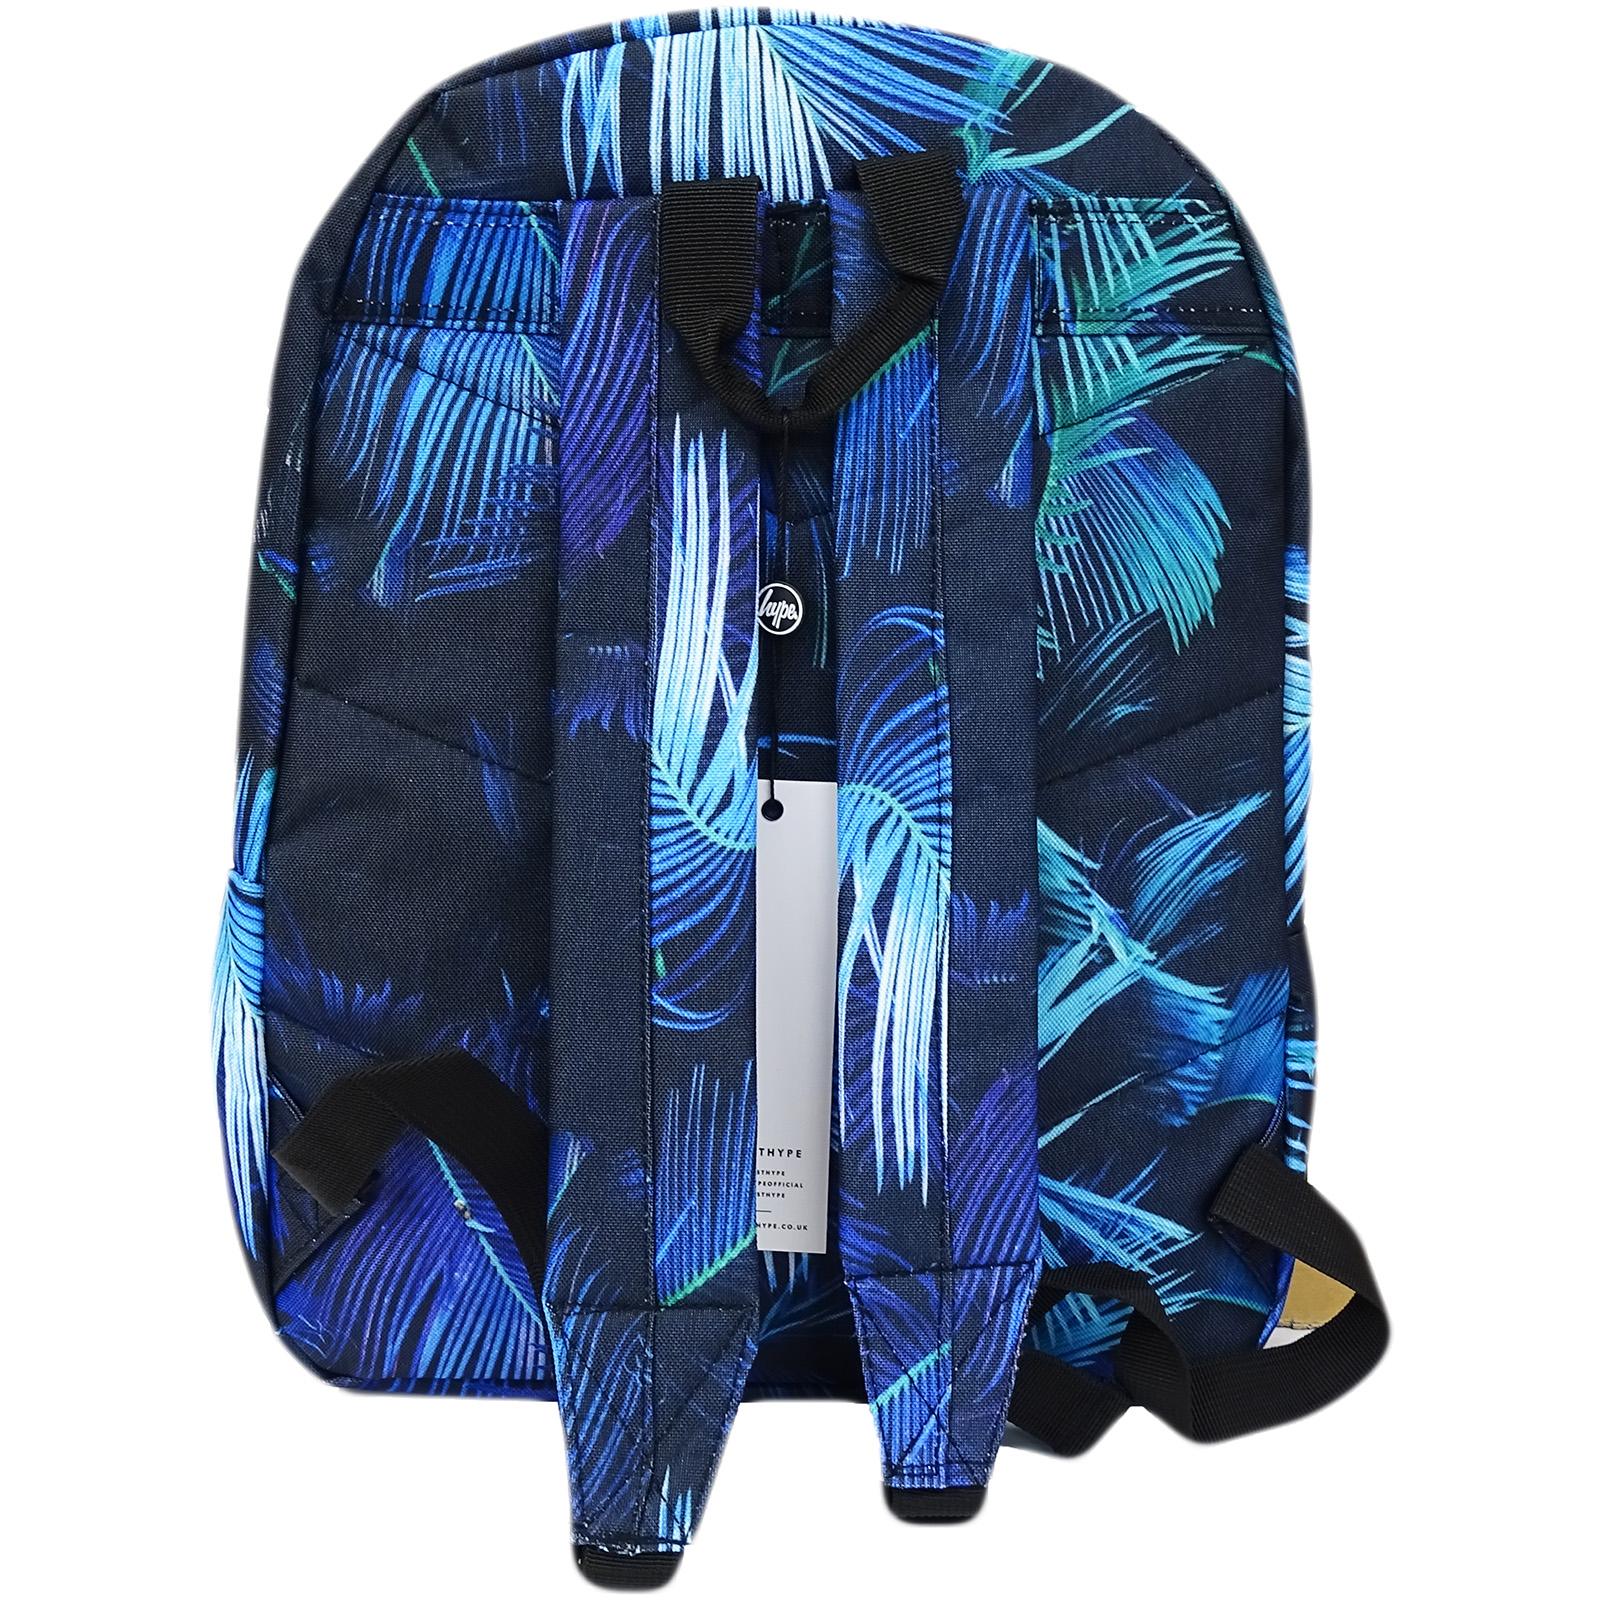 520334ece6c9 Boys   Girls Hype Backpack Bags - HYPE BAG - School Rucksack